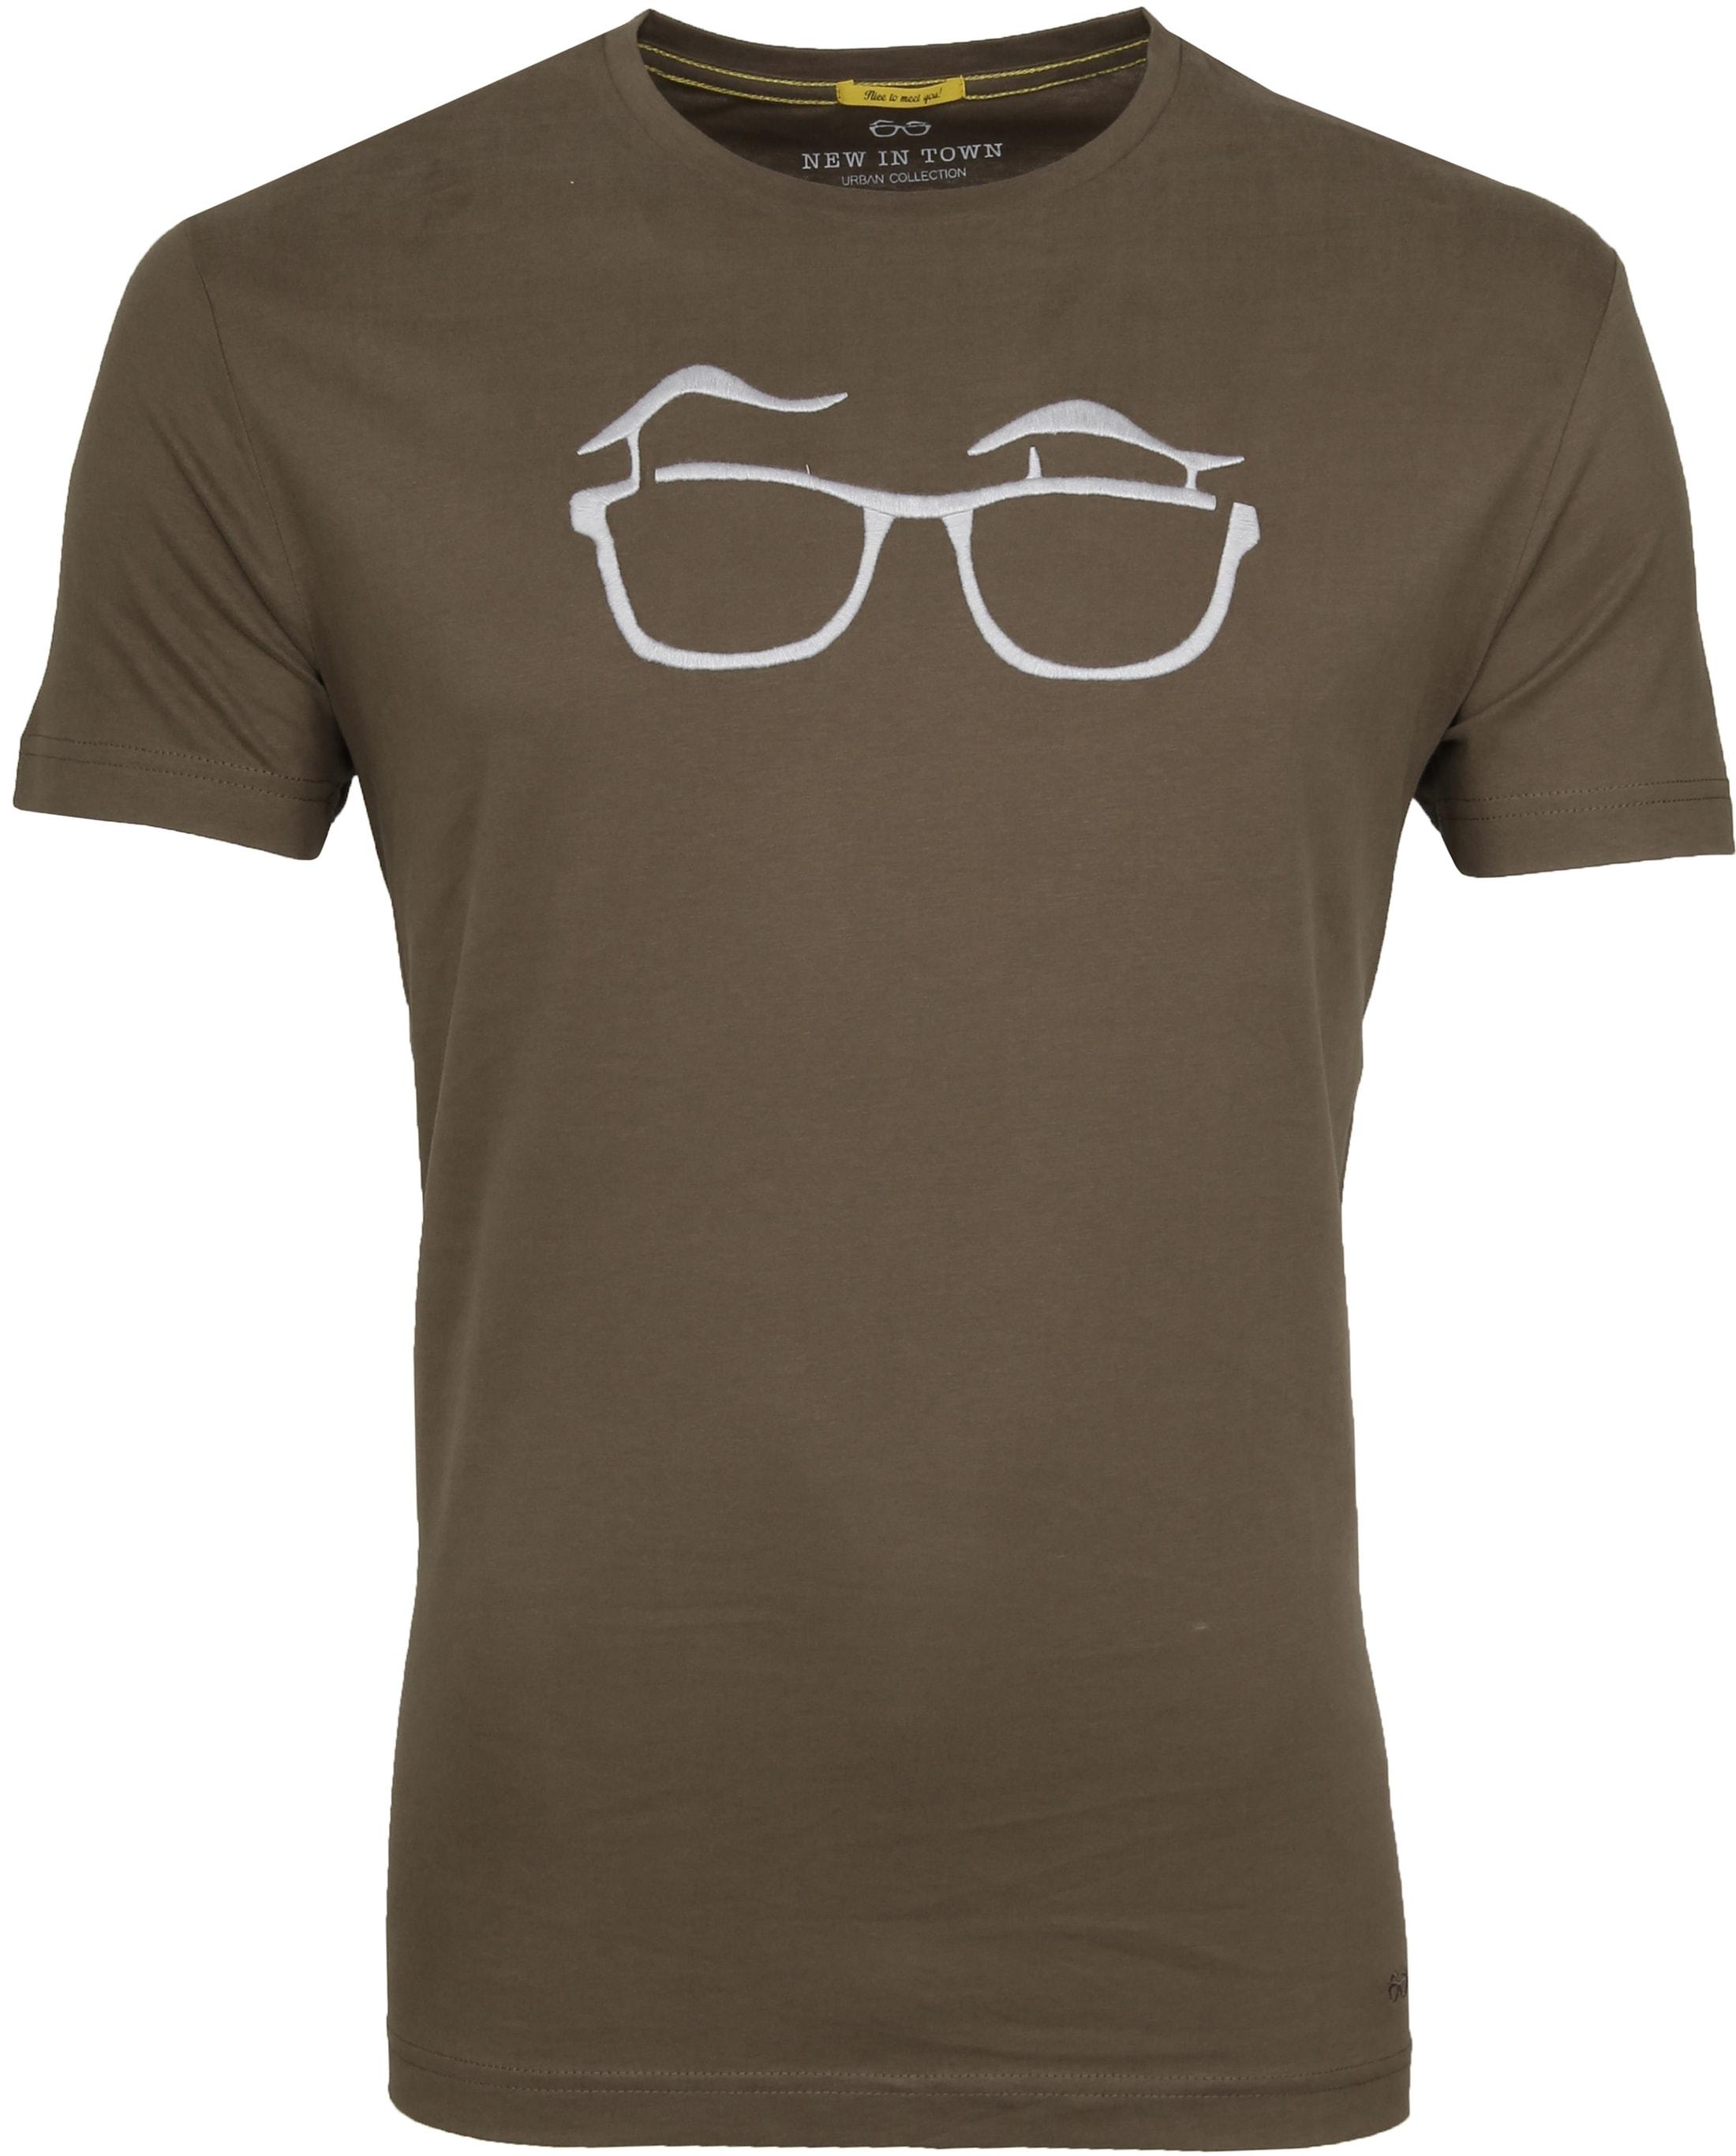 New in Town T-shirt Serafino Khaki foto 0